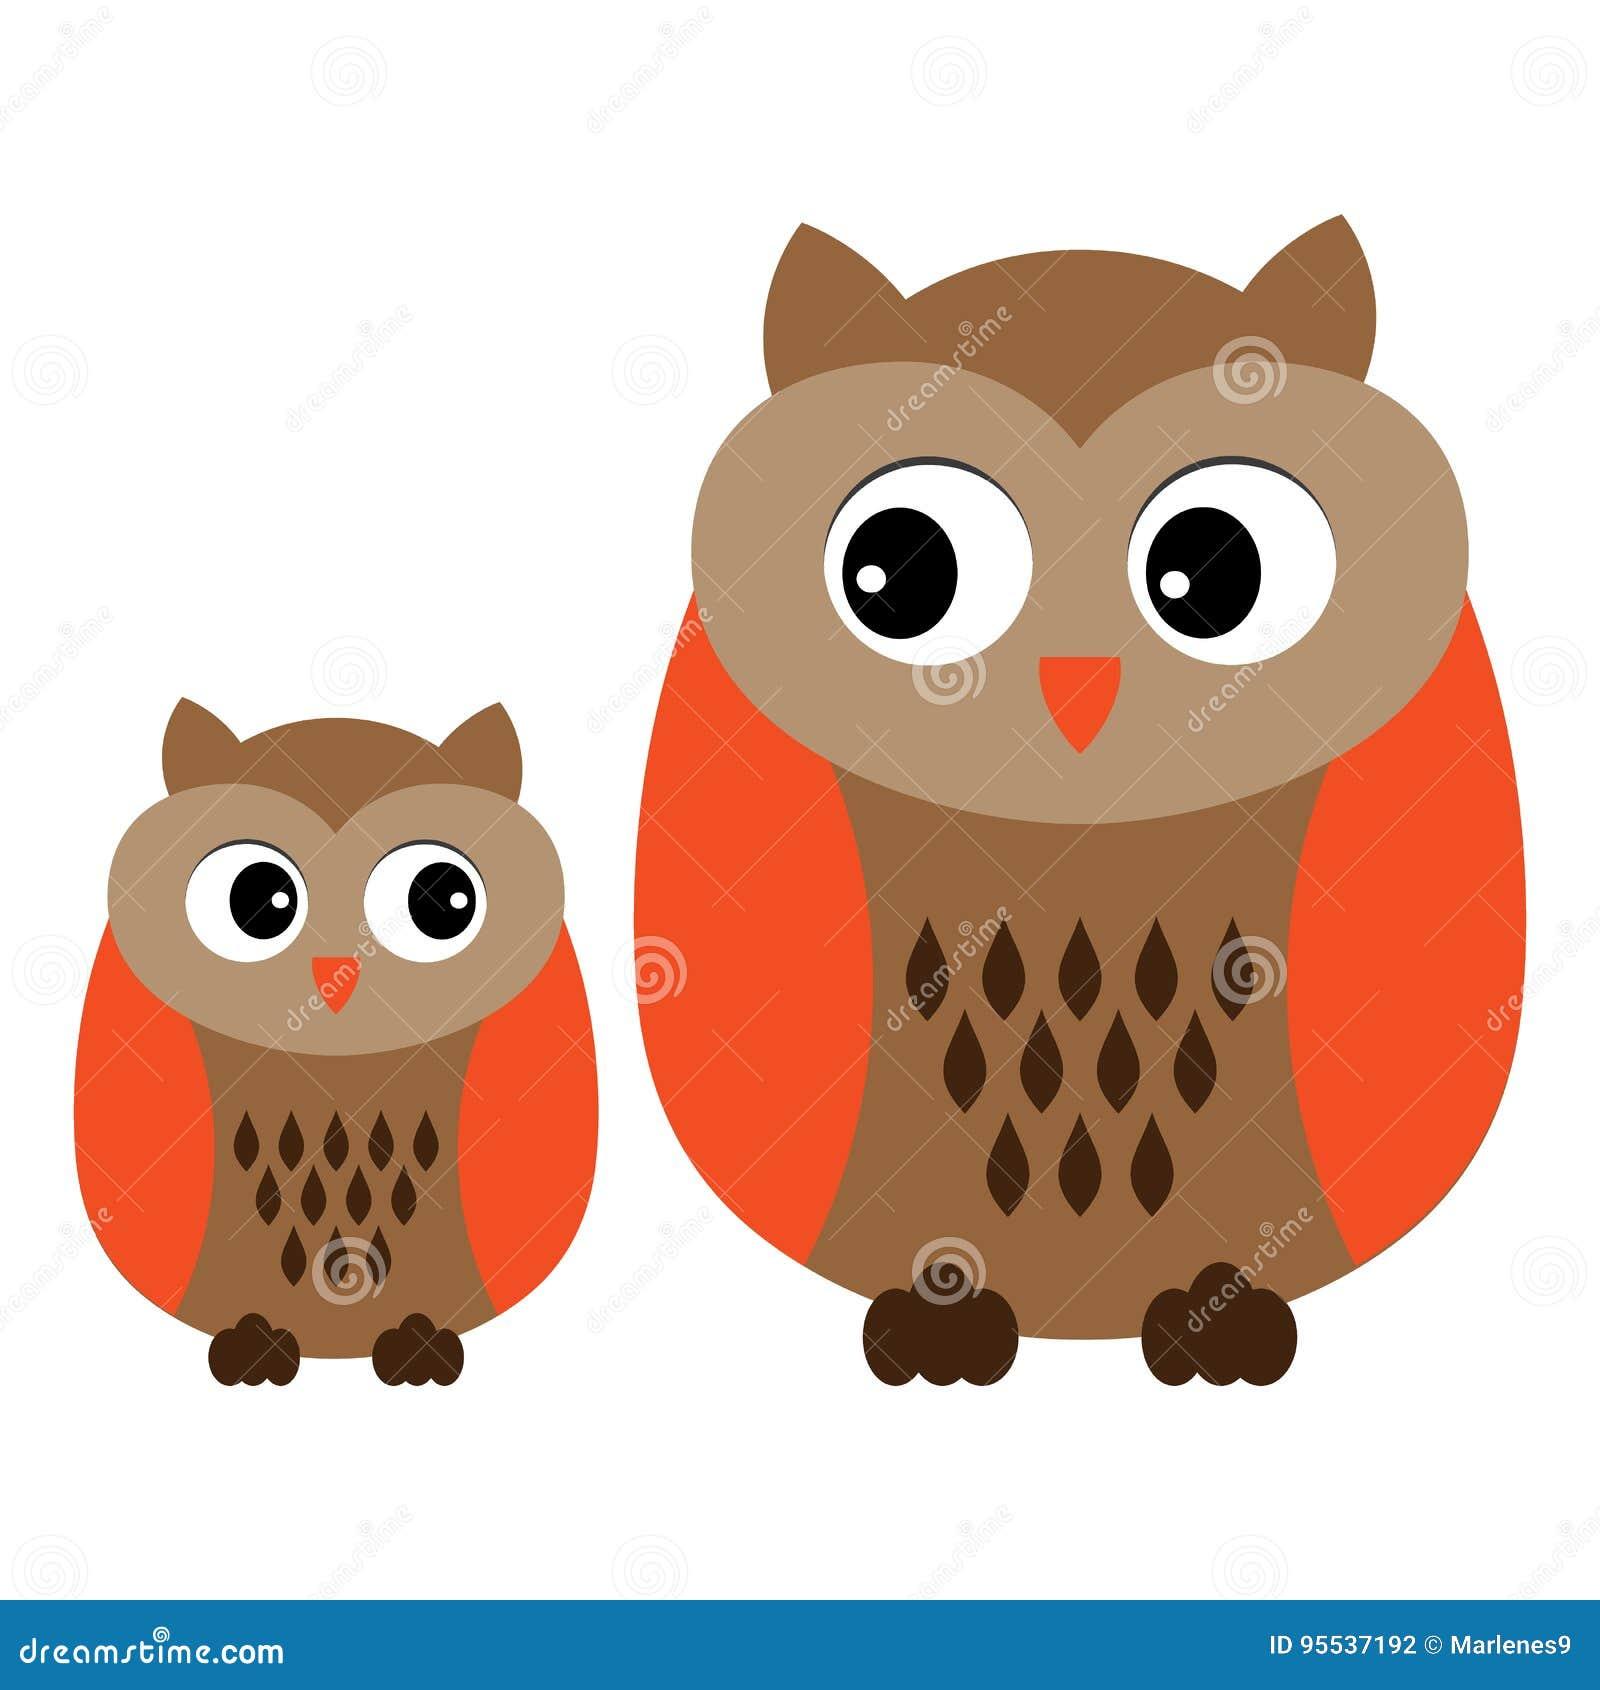 vector cute cartoon owls owls clipart baby owl vector illustration rh dreamstime com baby girl owl clipart baby owl clipart